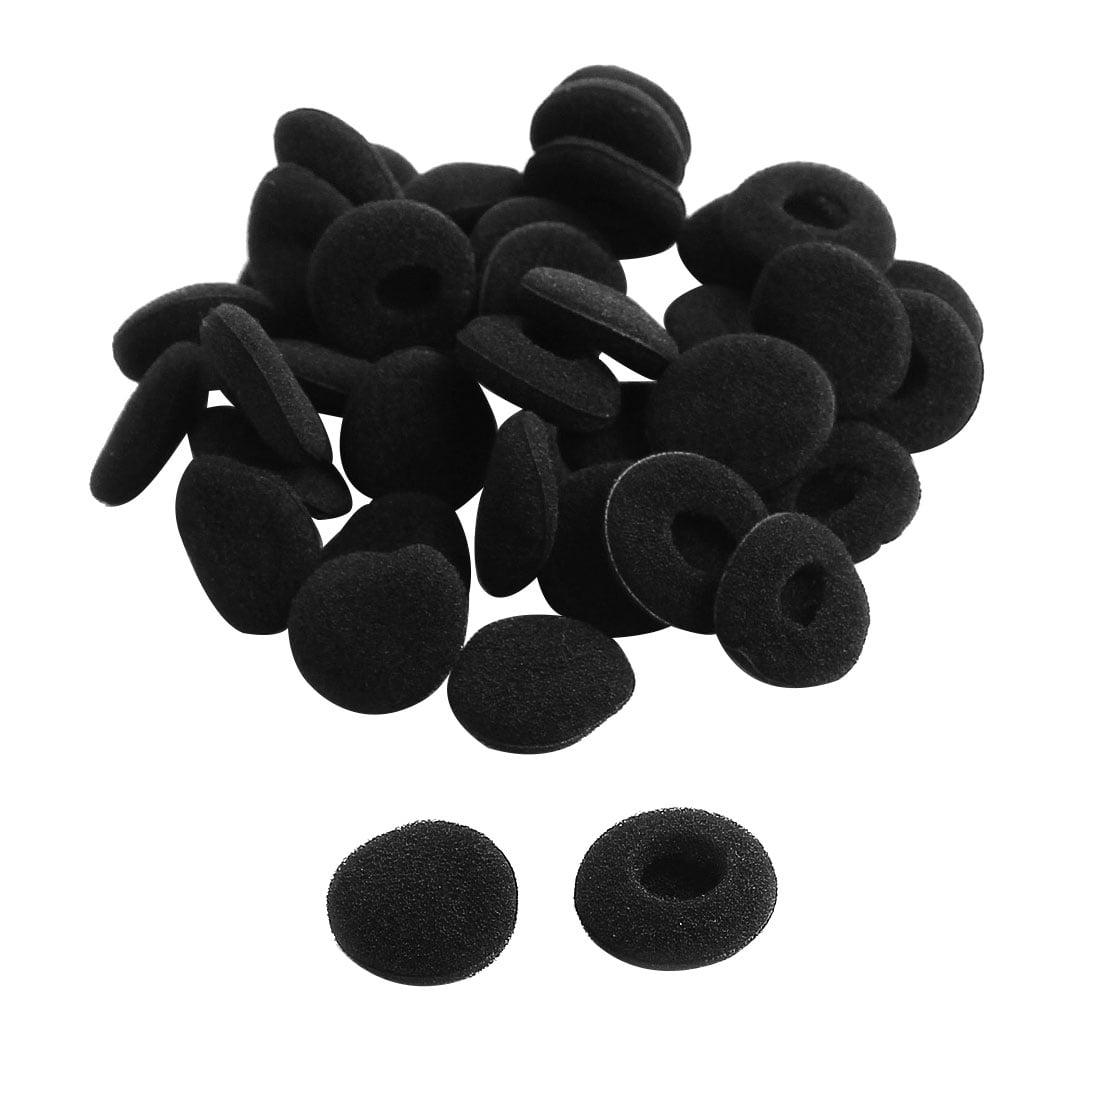 Sponge Noise Isolating Earphone Pad Earbud Cap Tip Cover Replacement Black 38 Pcs